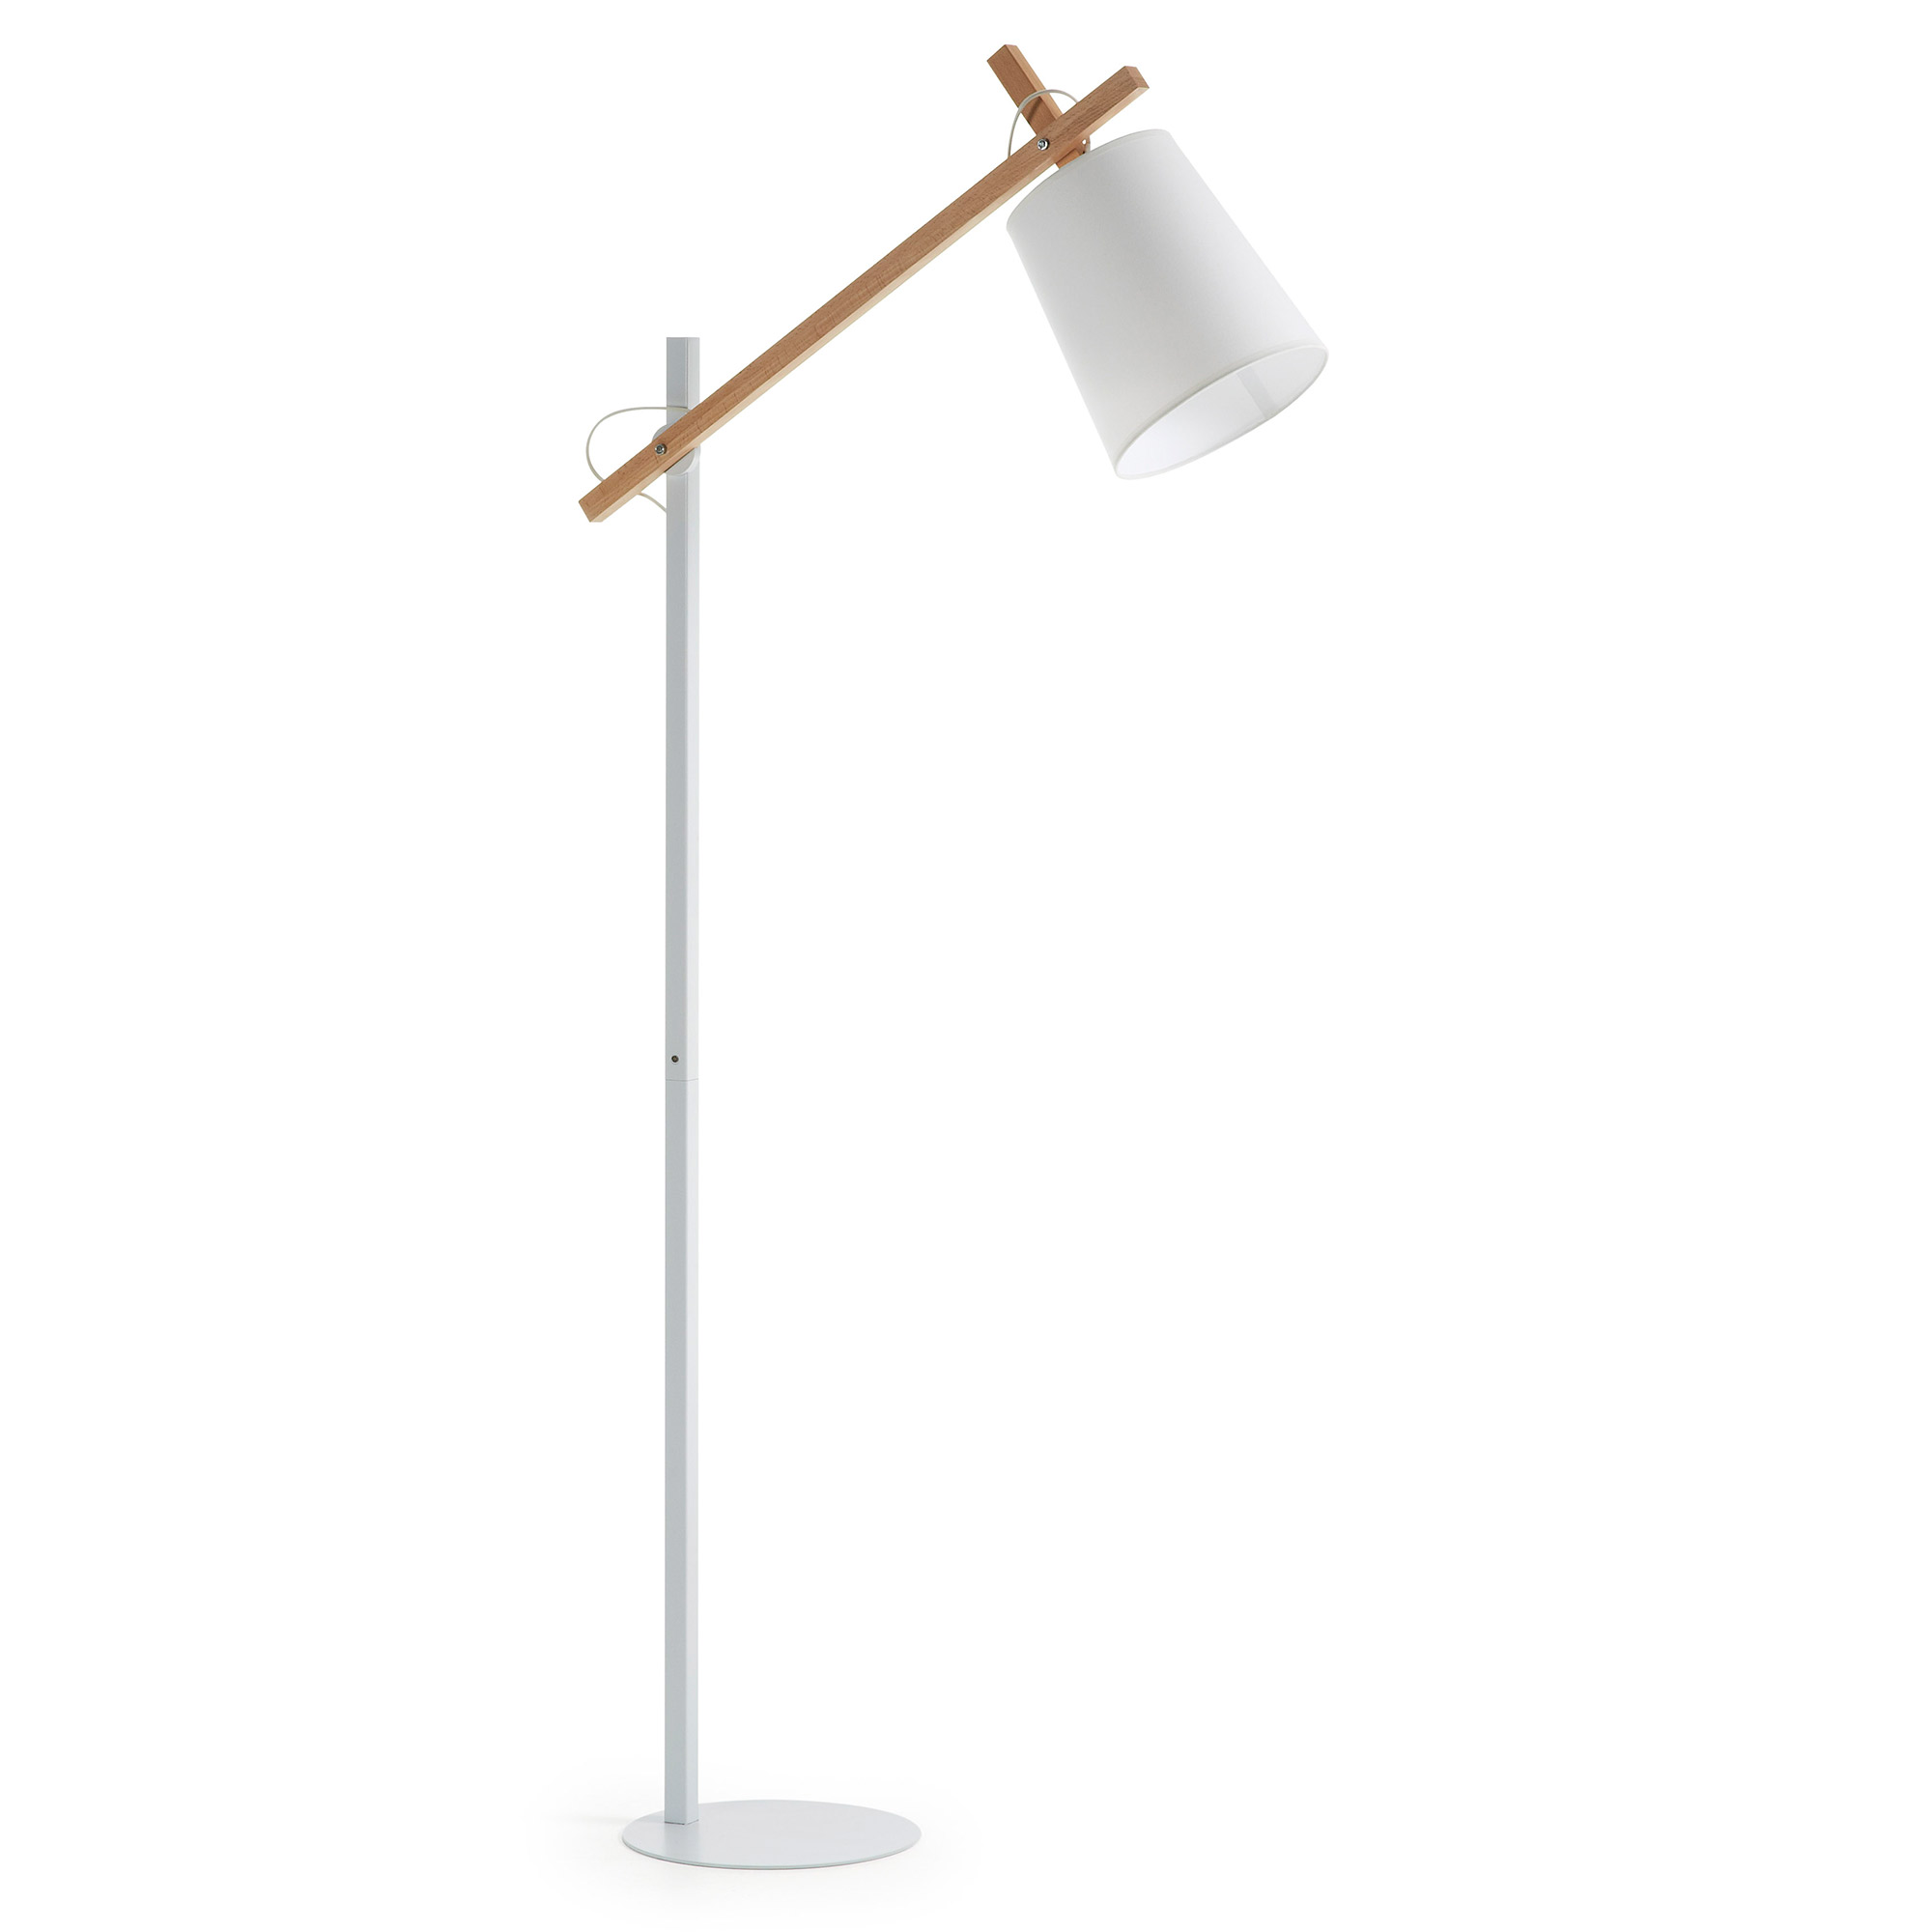 Kave Home - Kosta Stehlampe, weiss | Lampen > Stehlampen > Standleuchten | Kave Home